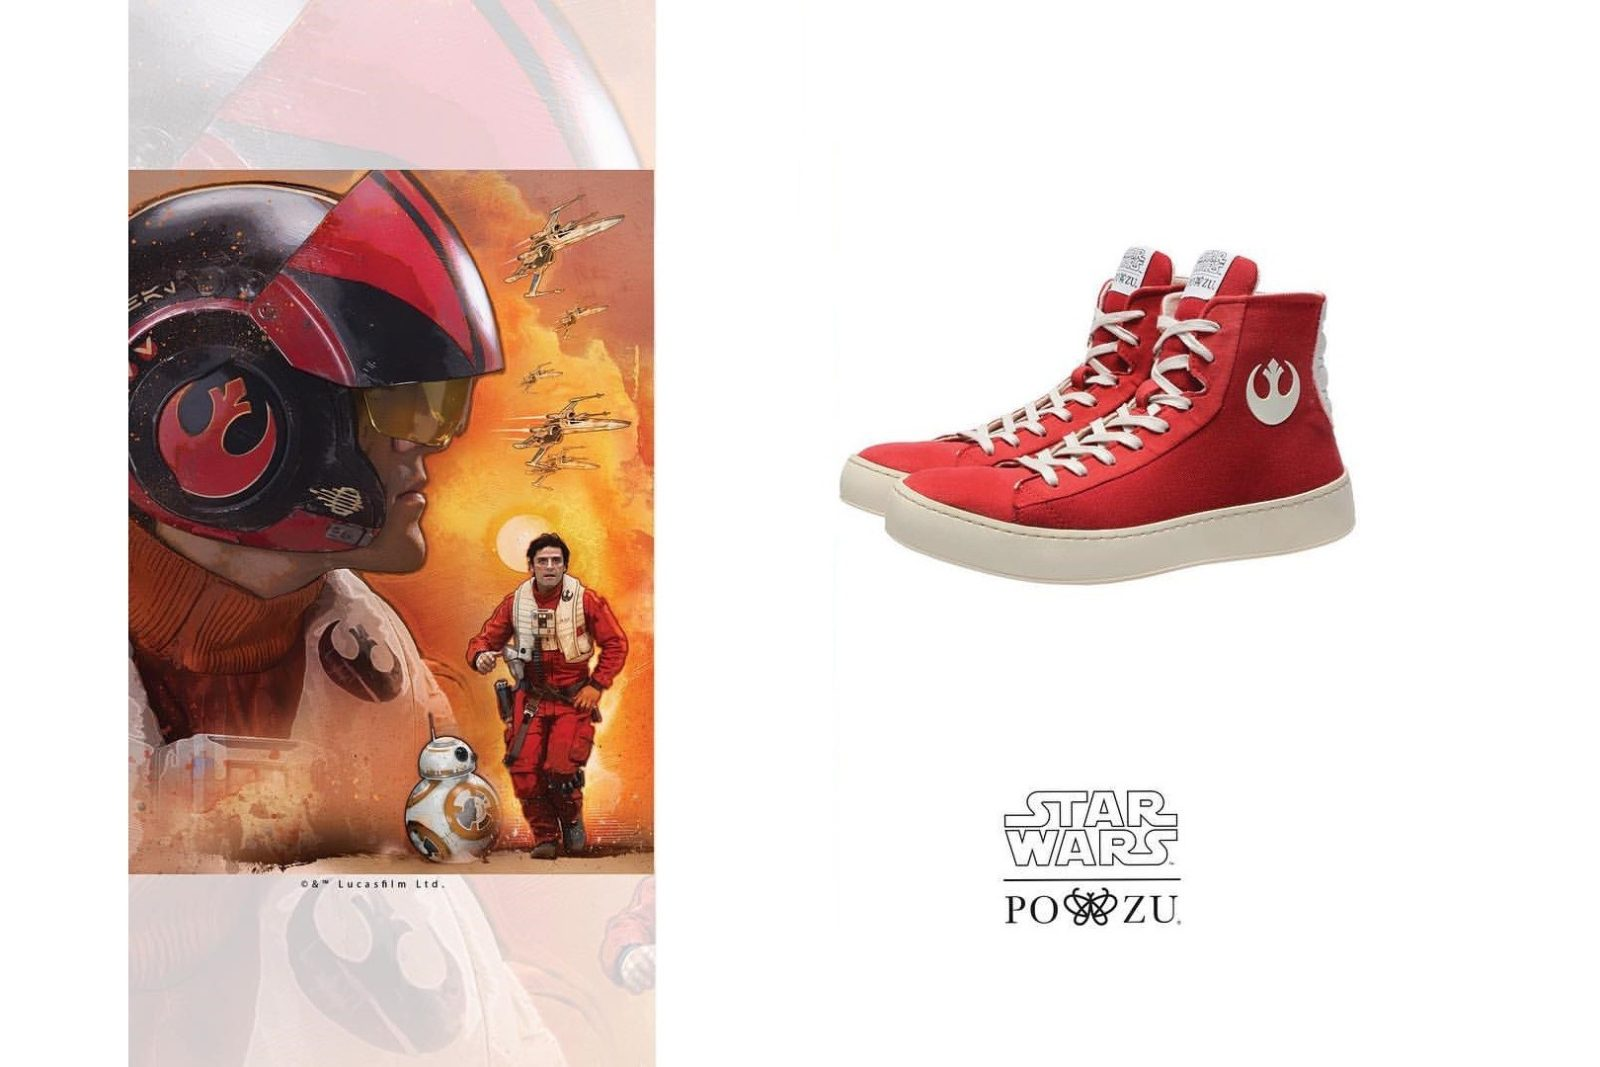 Po-Zu x Star Wars Resistance shoe preview!